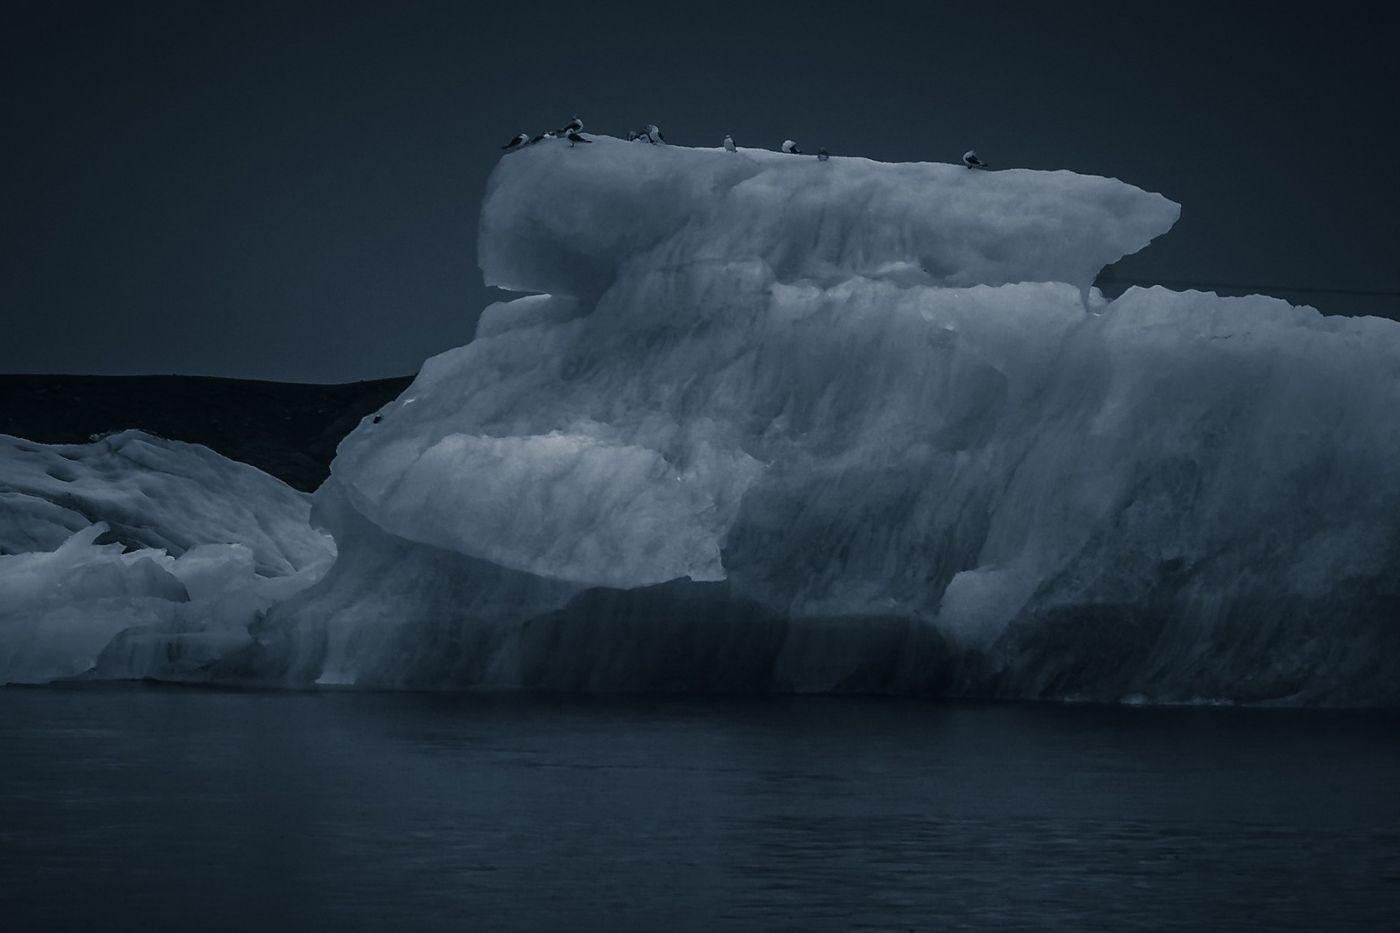 冰岛冰川泻湖(Glacier Lagoon),流动的冰川_图1-6